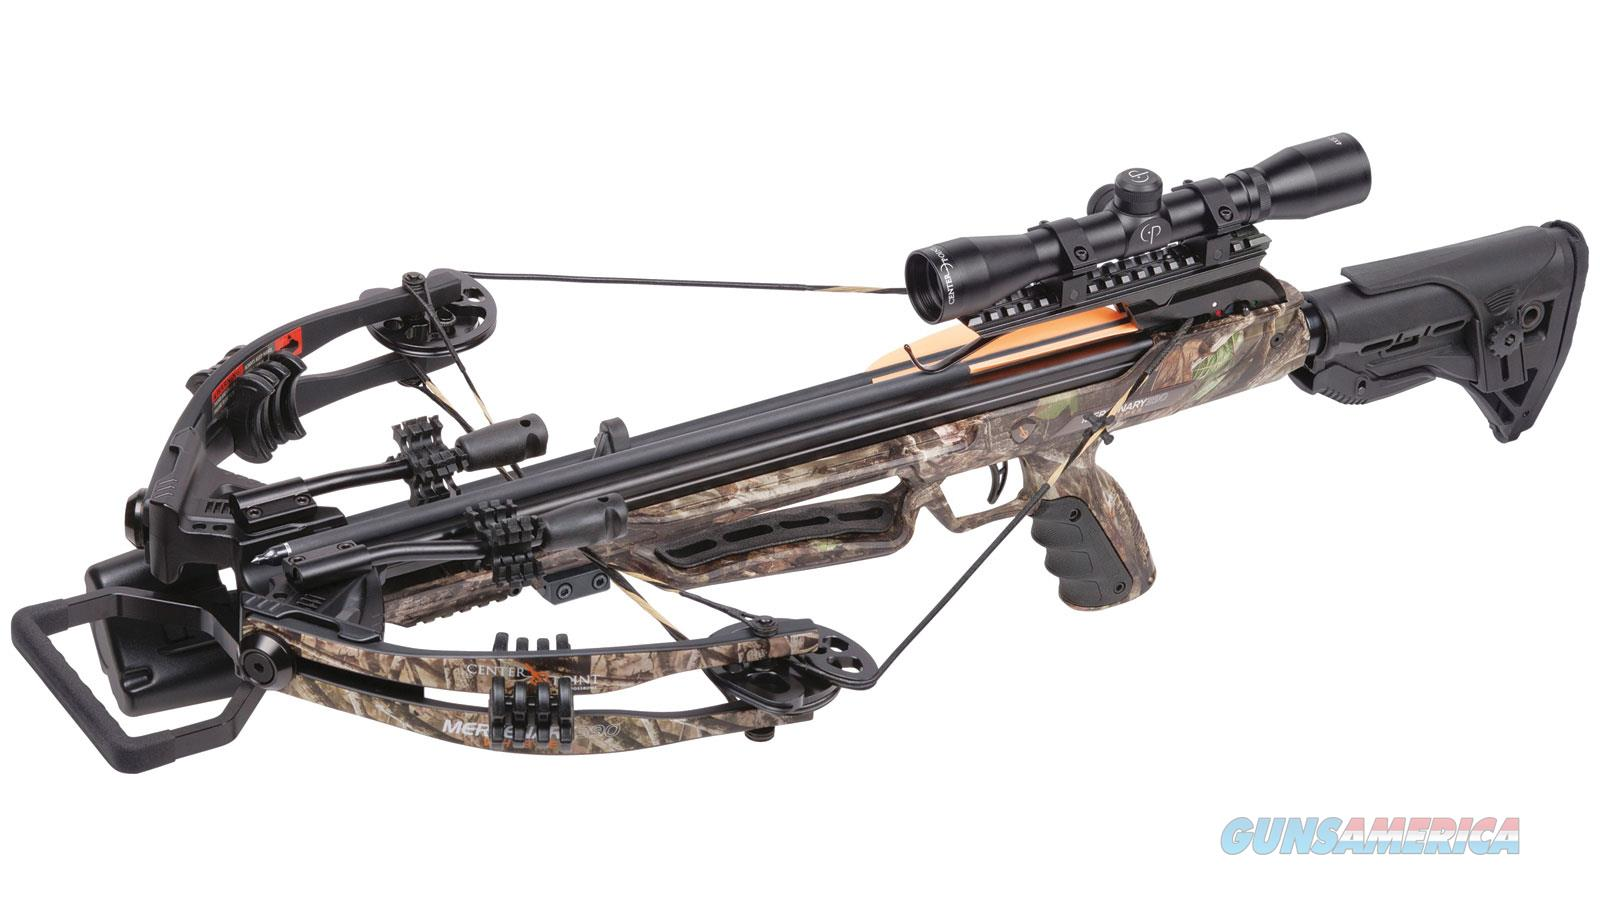 Crosman Mercenary Whisper 390 Adj S AXCMW185CK  Non-Guns > Archery > Bows > Crossbows